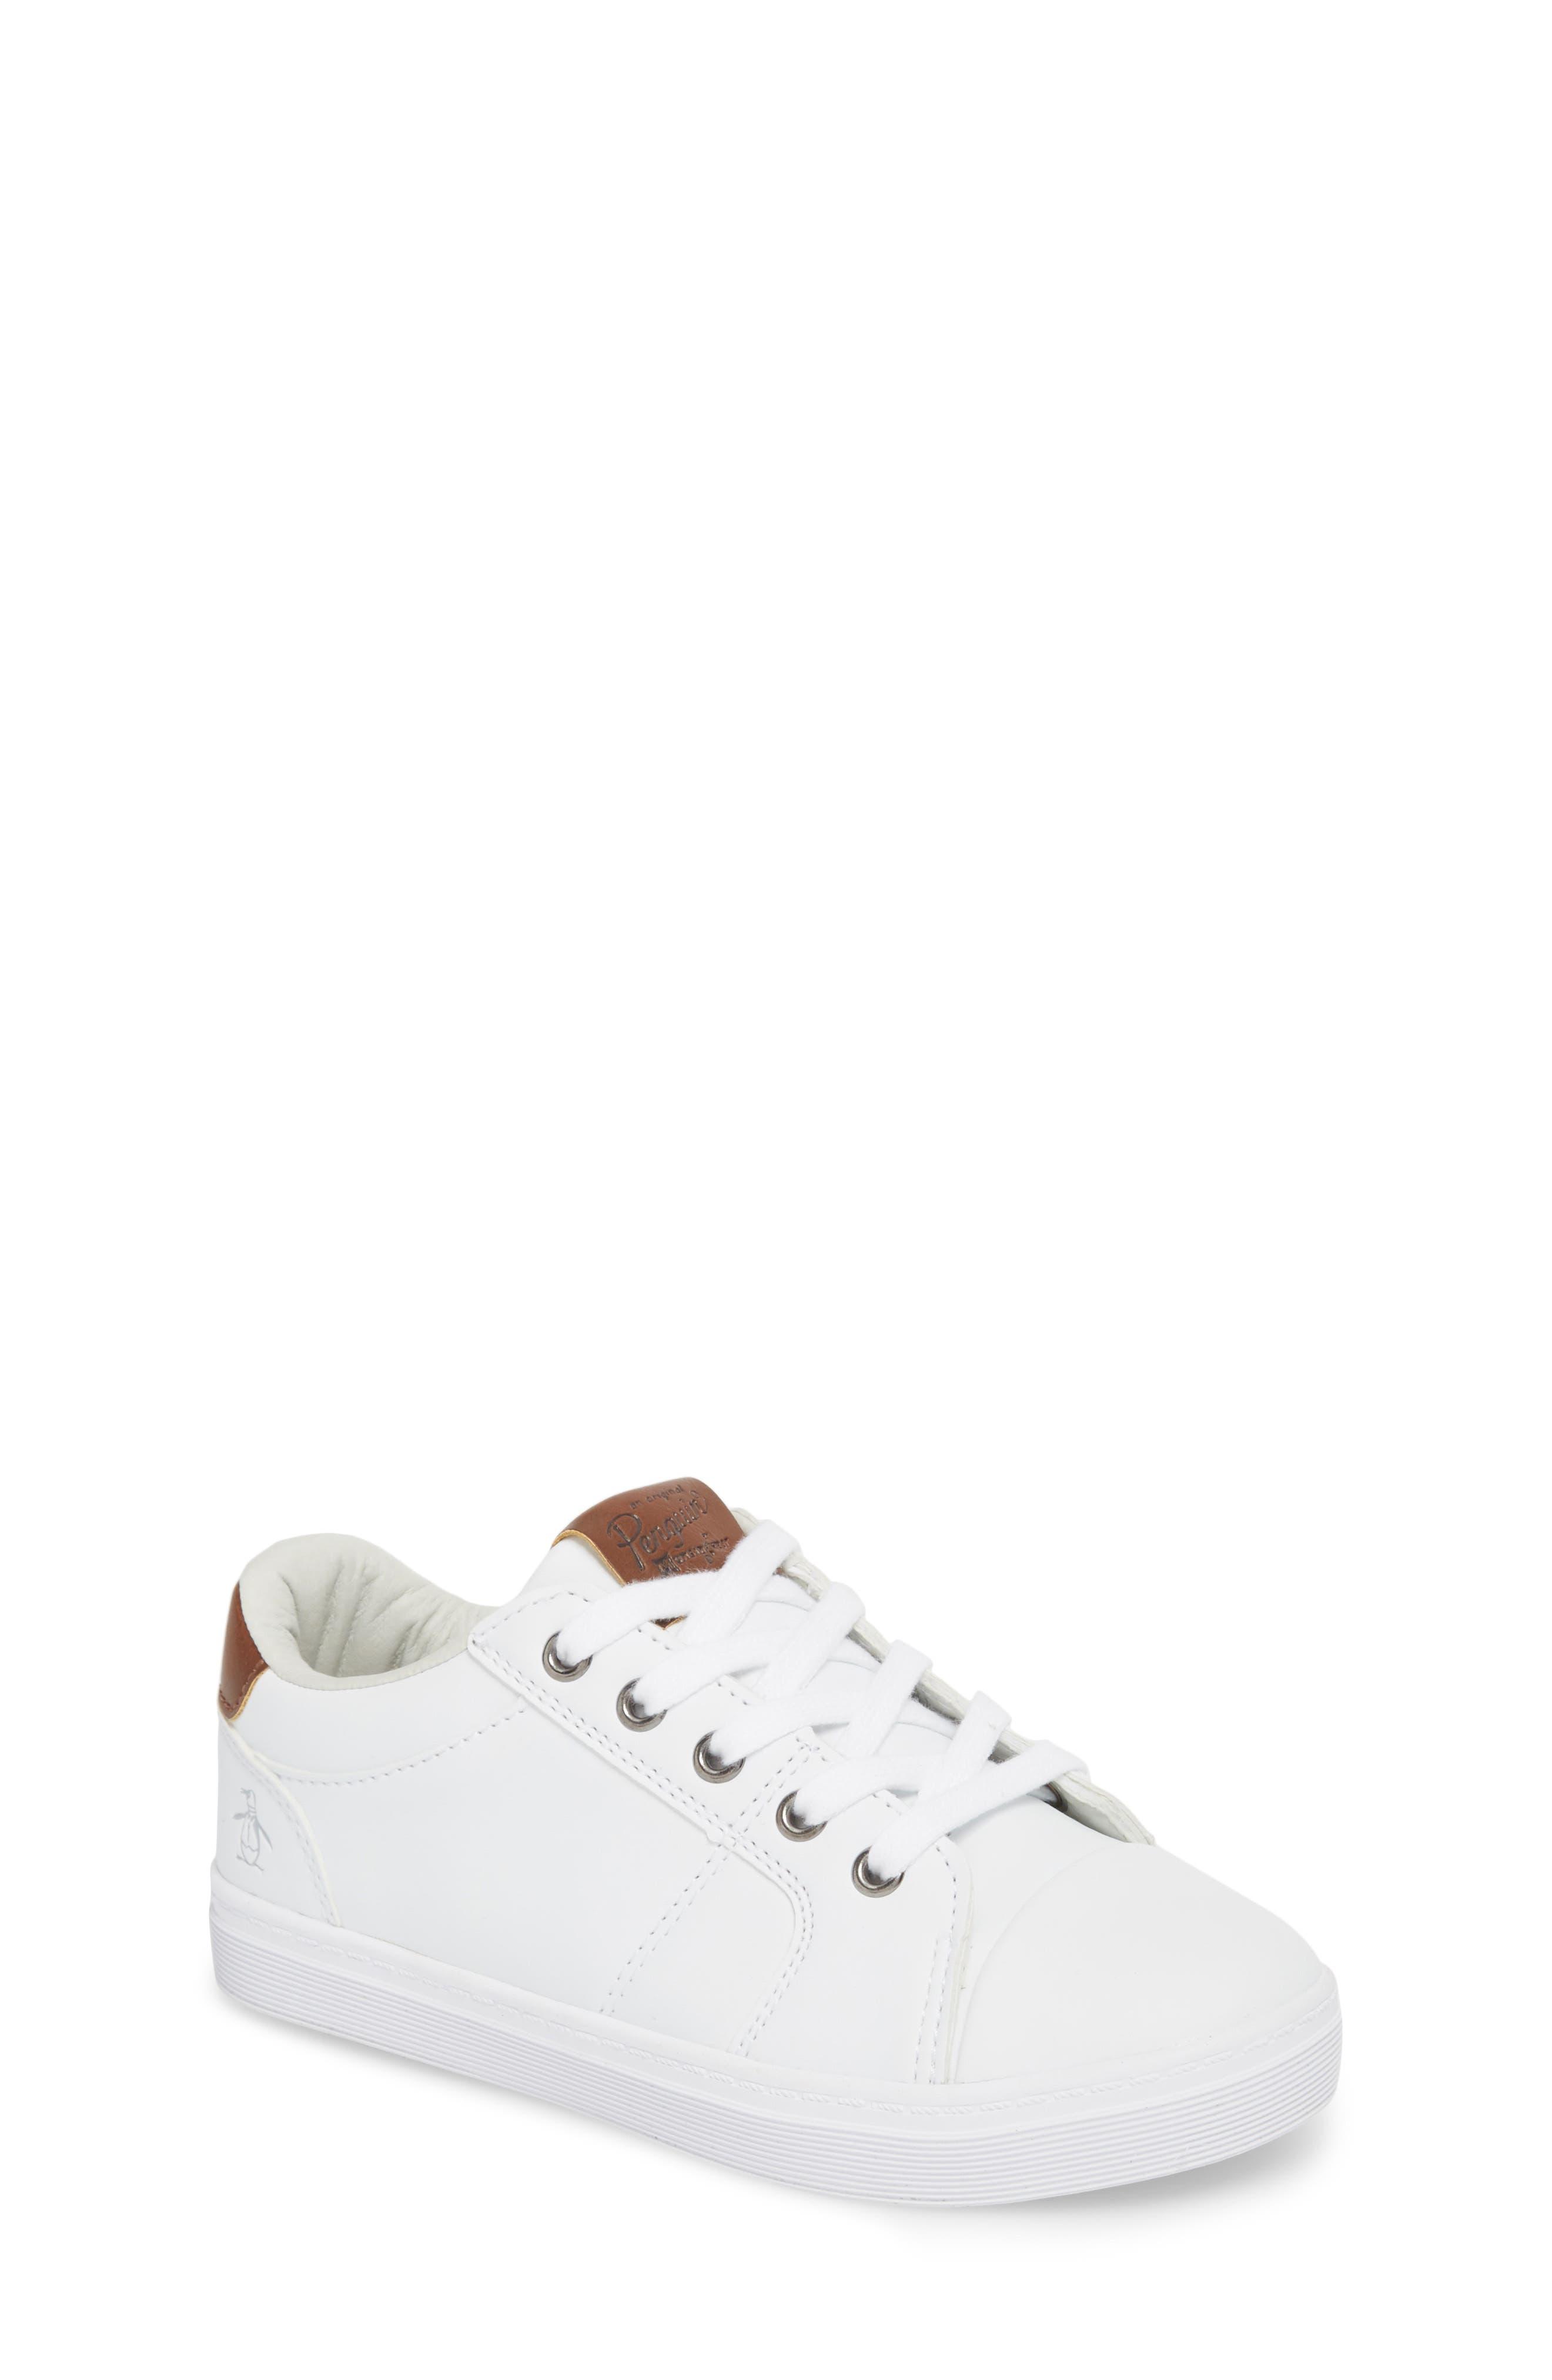 Cobin Sneaker,                         Main,                         color, White/ Cognac